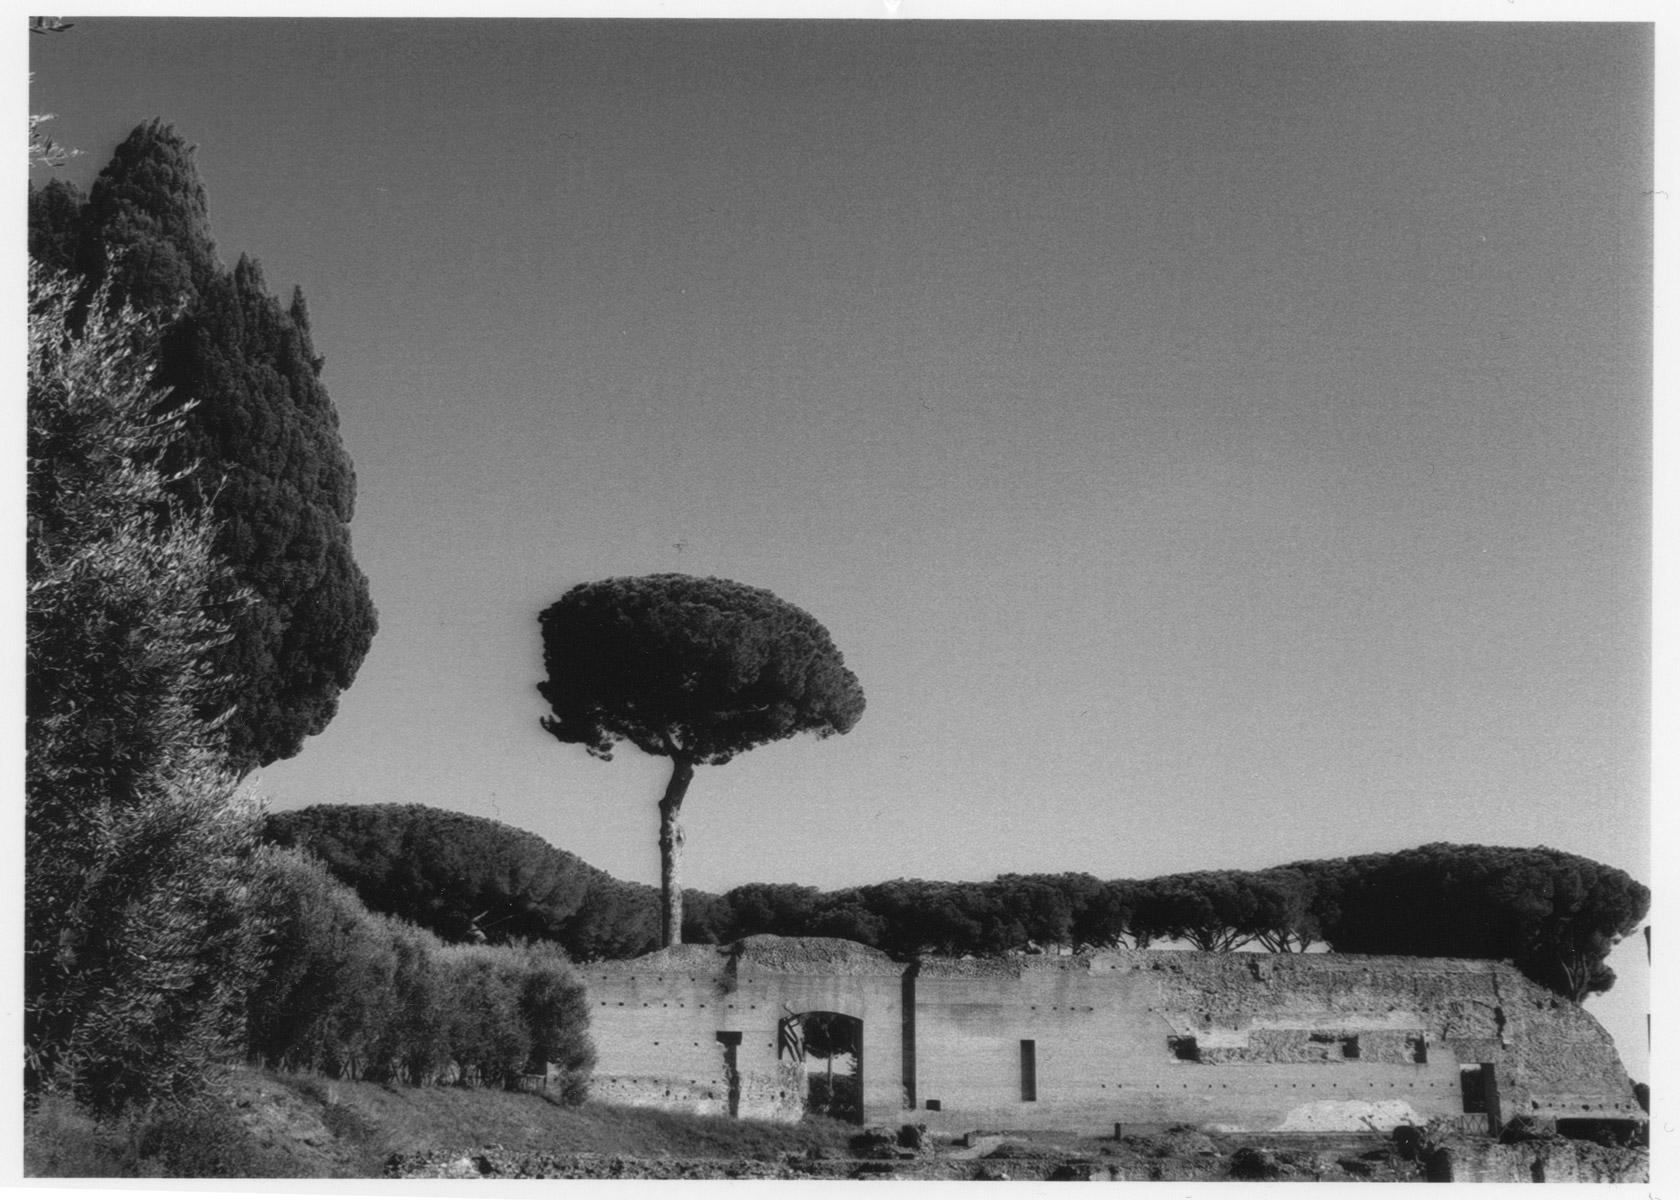 Rome-Matthew-Attard-Navarro-03.jpg